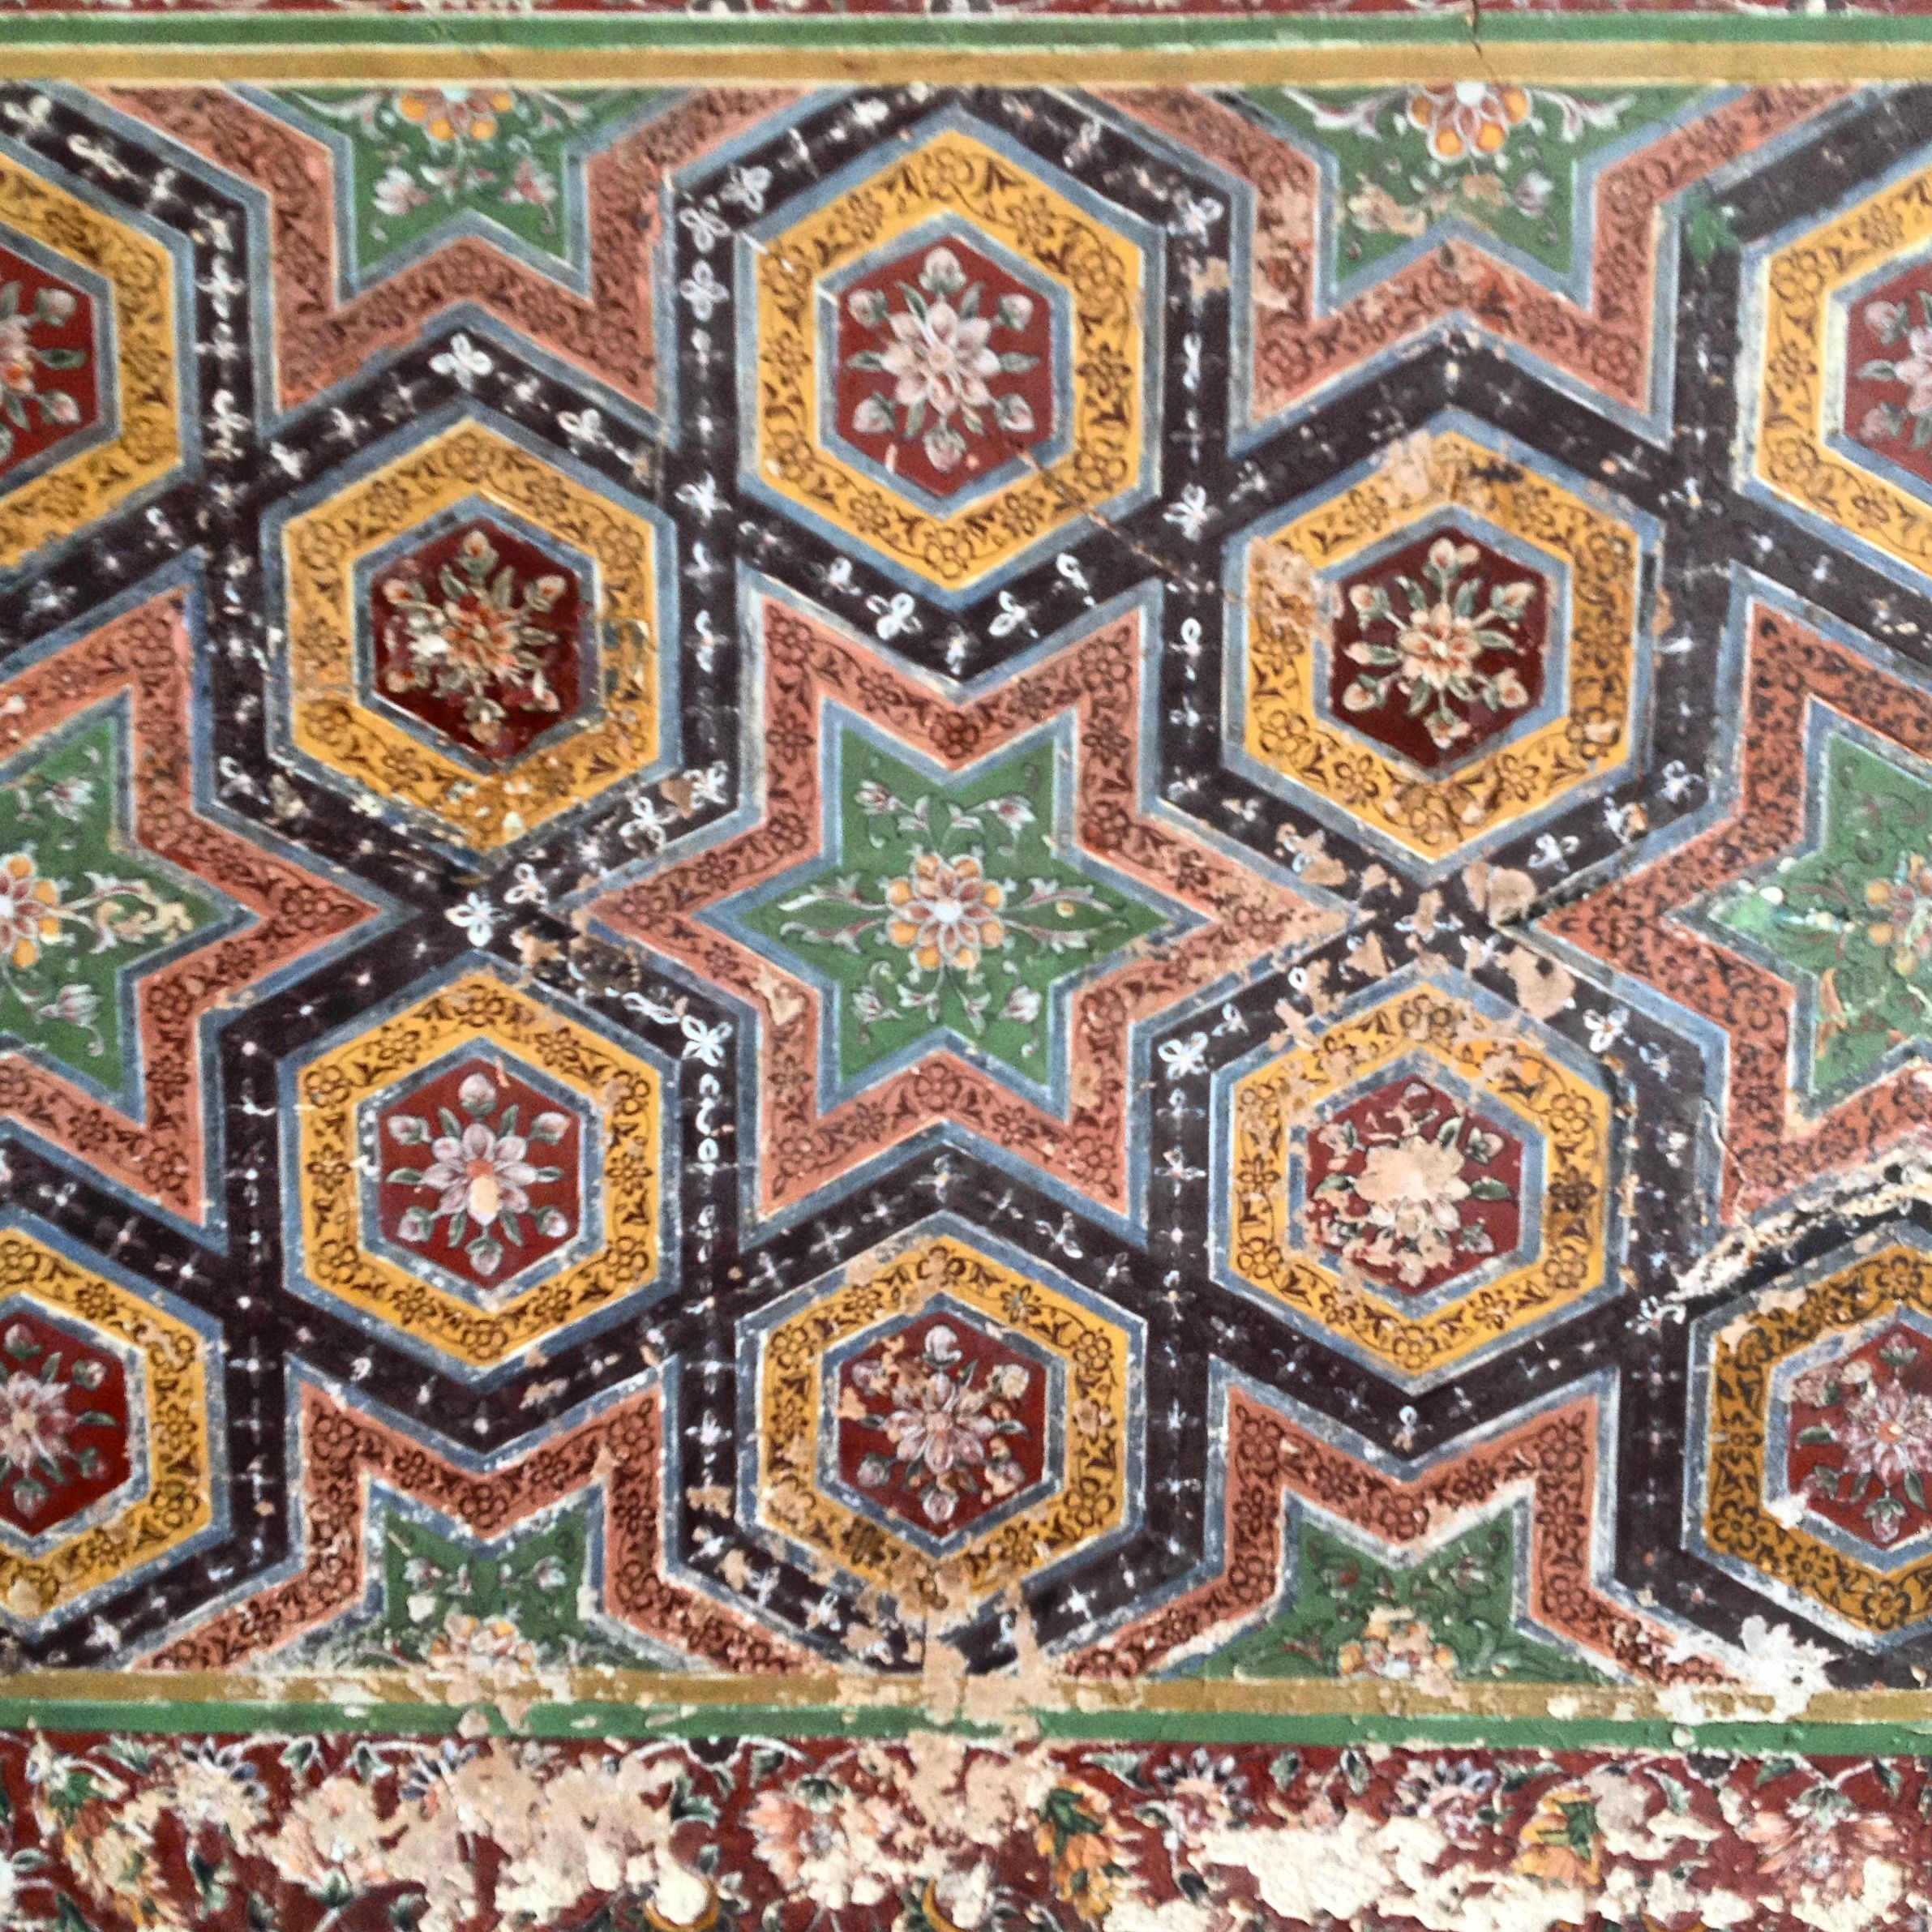 Img 20150122 110604 Jpg 2383 2383 Islamic Art Walled City Bohemian Rug